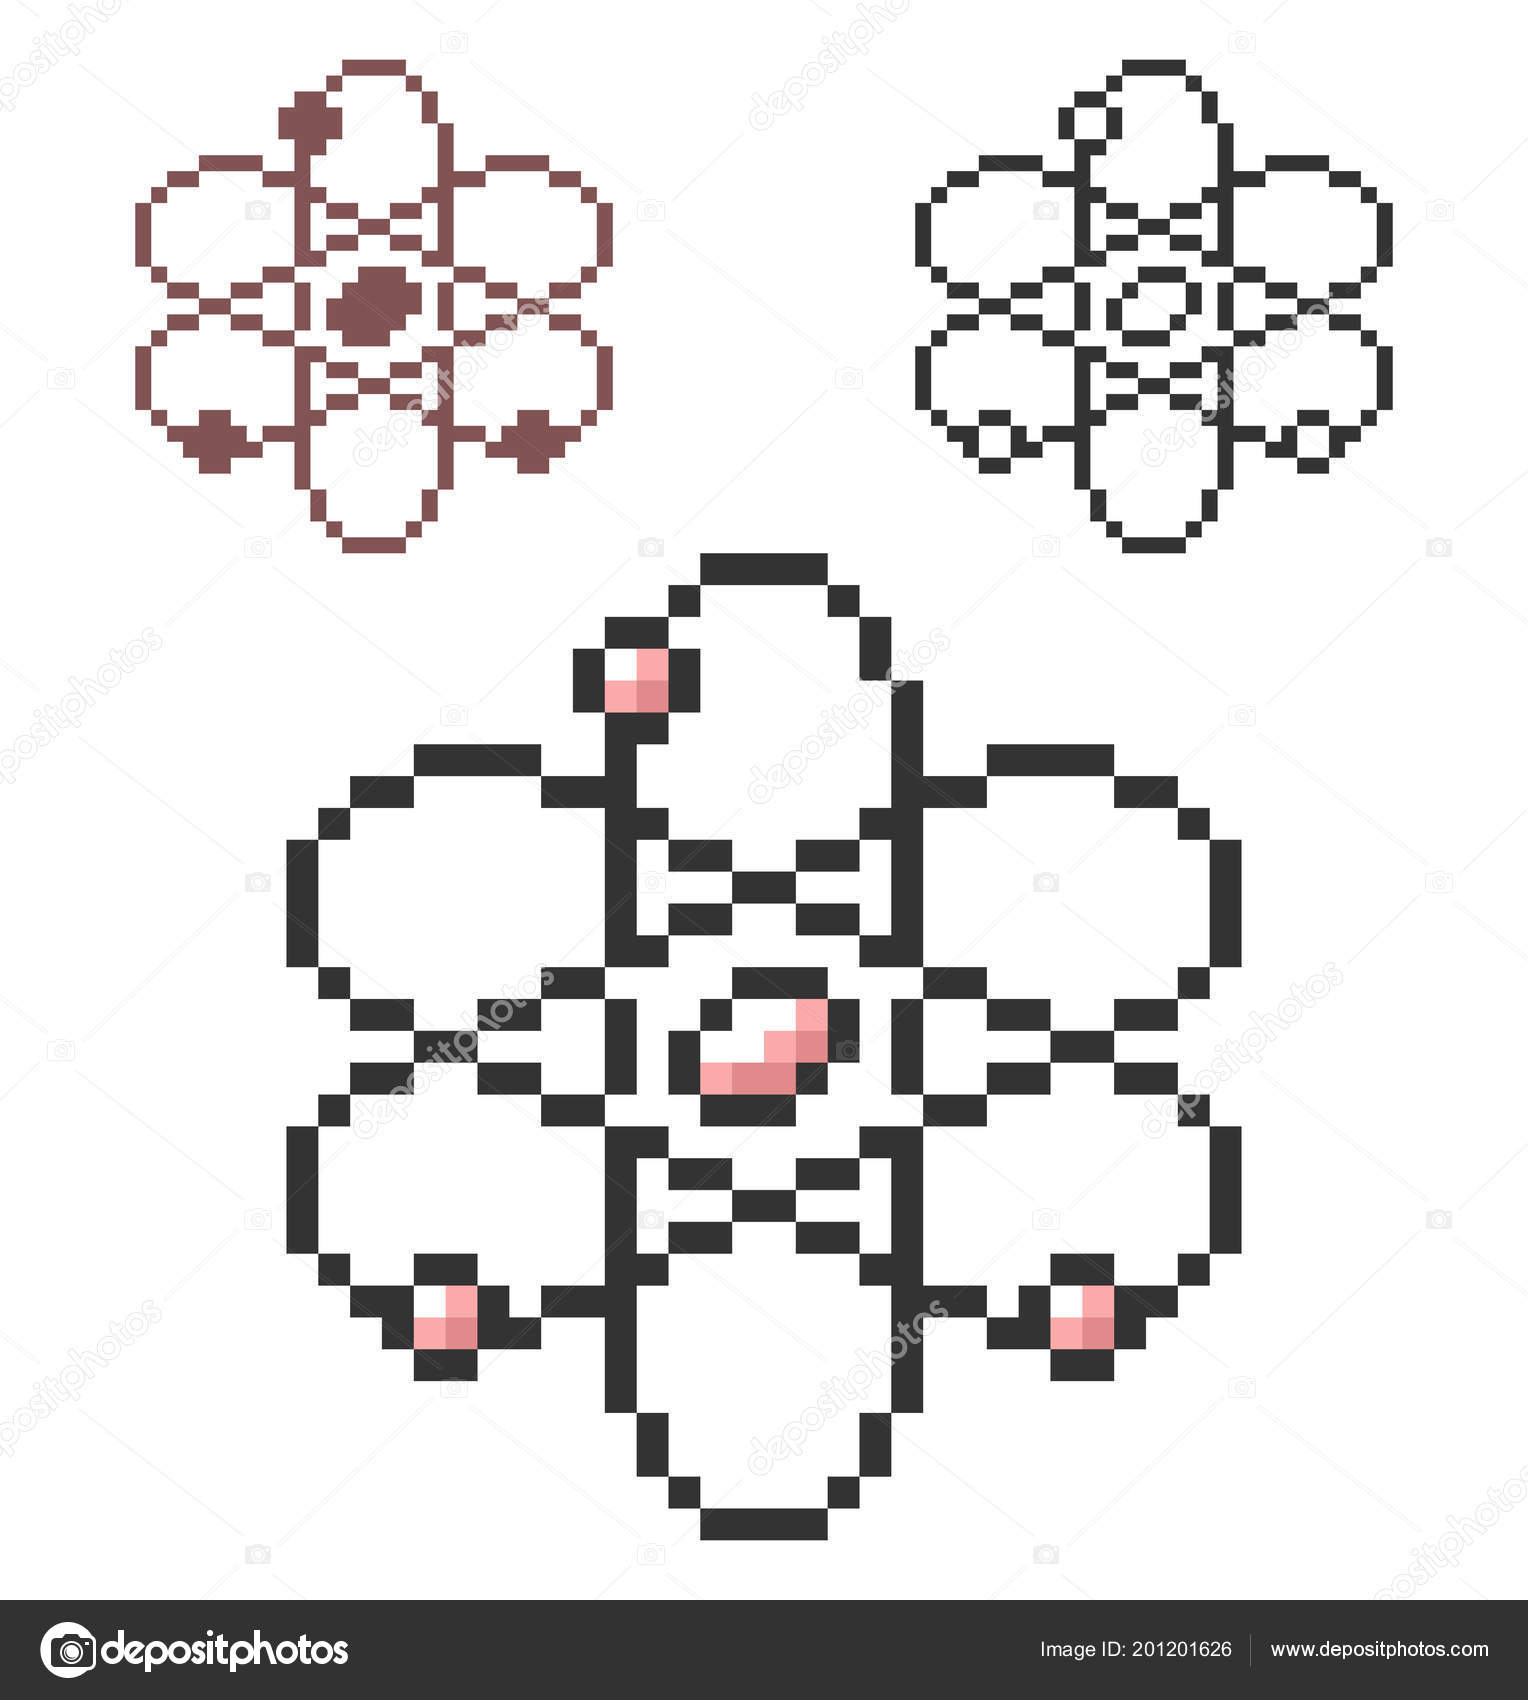 hight resolution of pixel icon atom model three variants fully editable stock vector